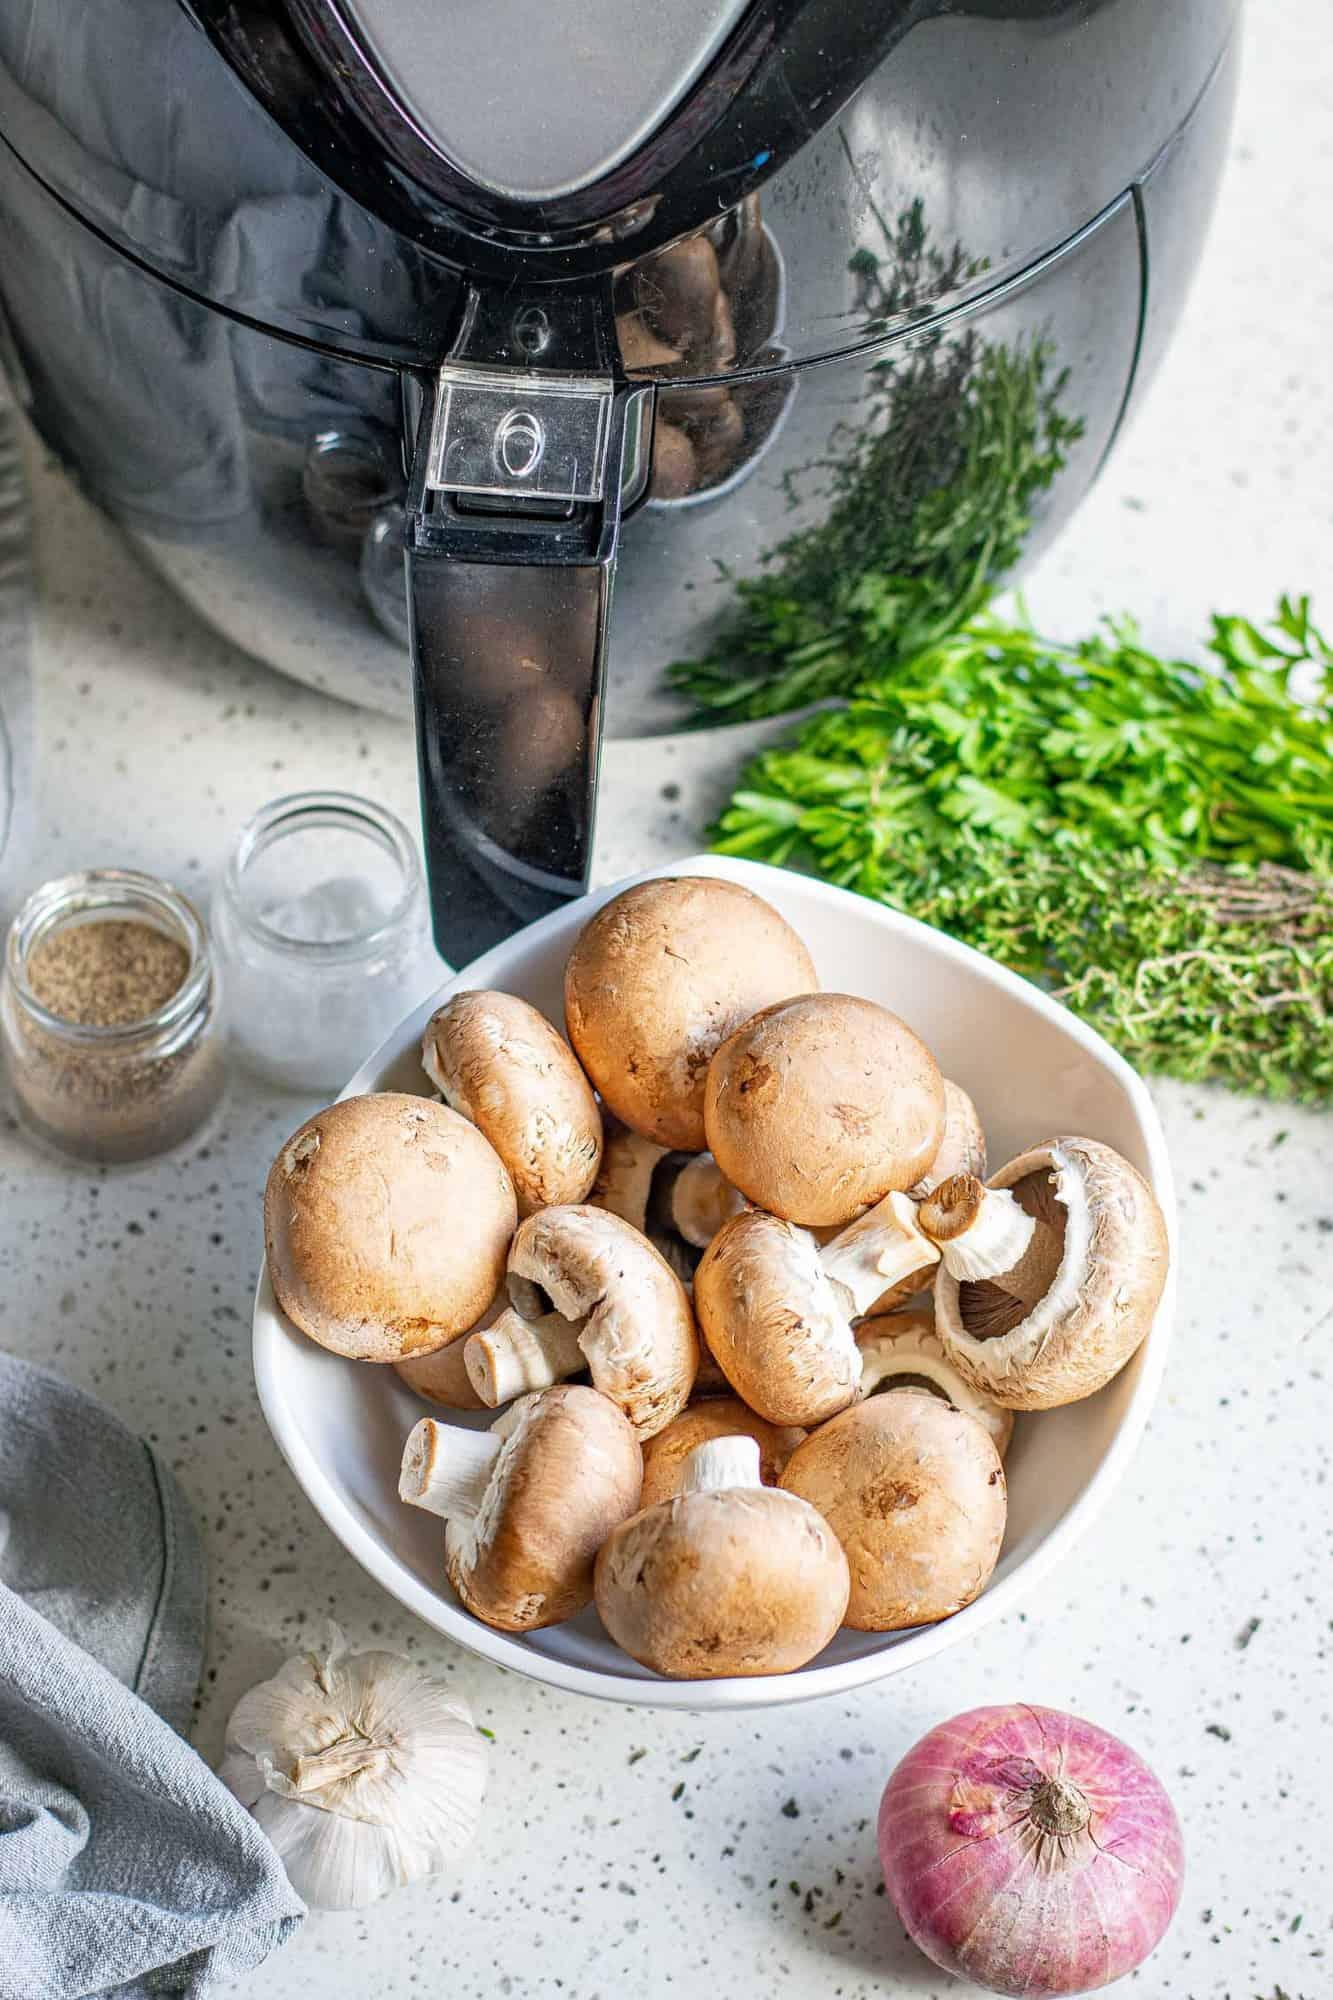 Air fryer, a bowl of fresh mushrooms, a shallot, and fresh herbs.